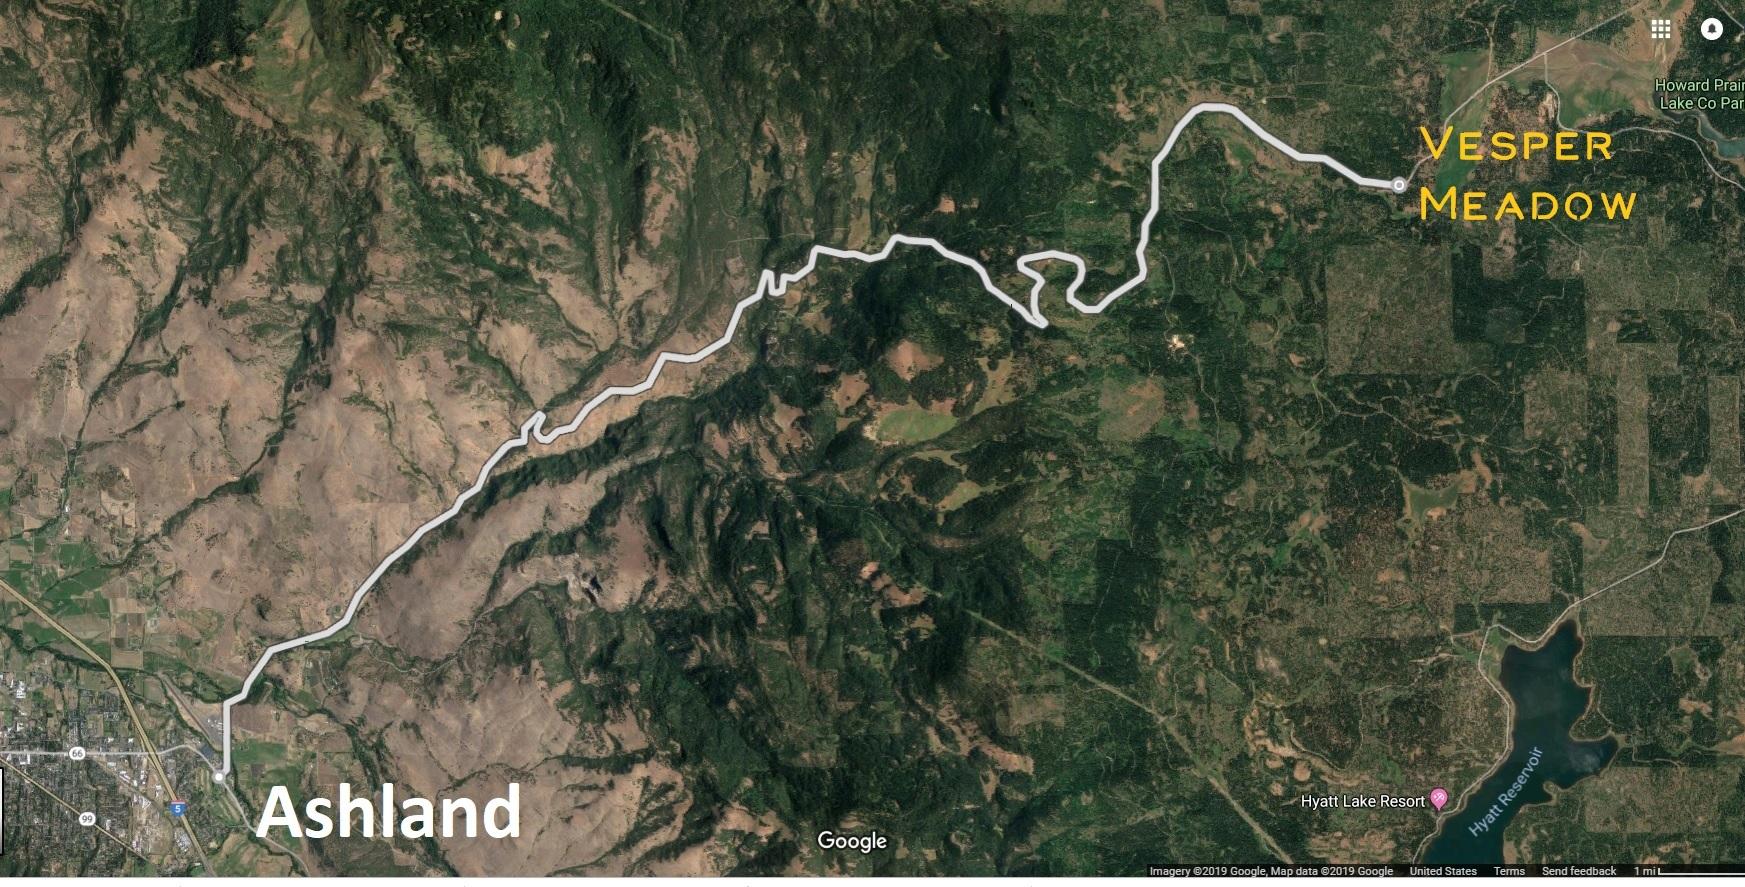 vesper-meadow-ashland-directions